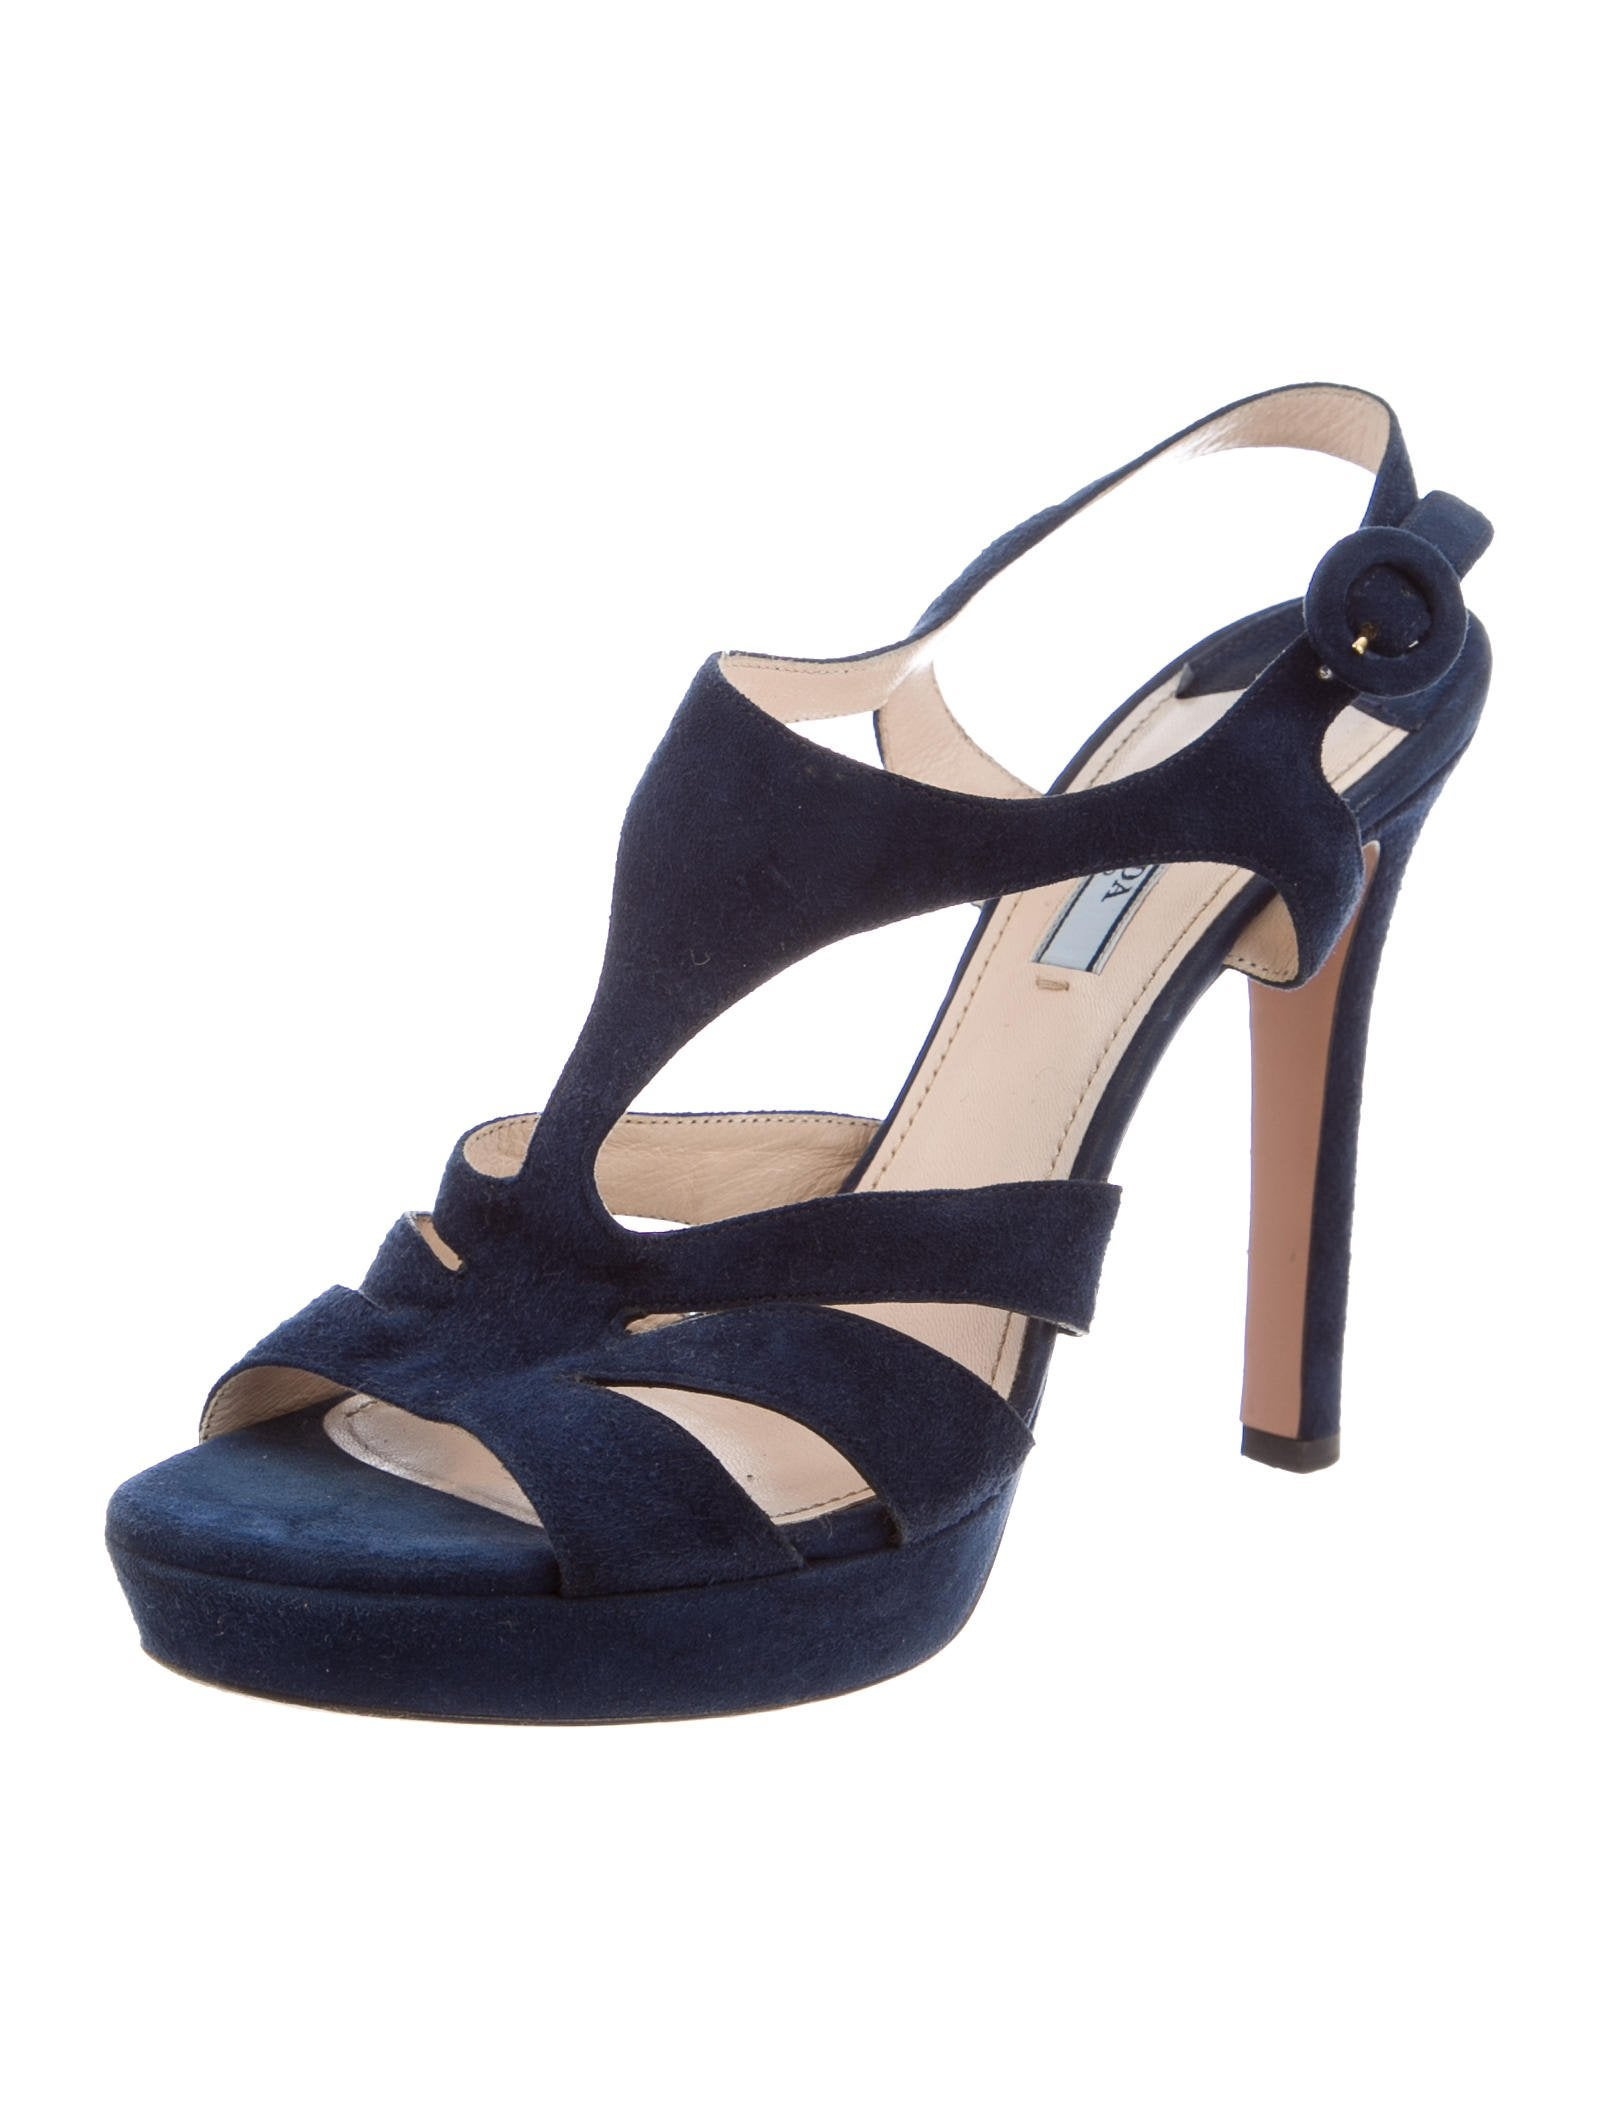 prada t platform sandals shoes pra140245 the